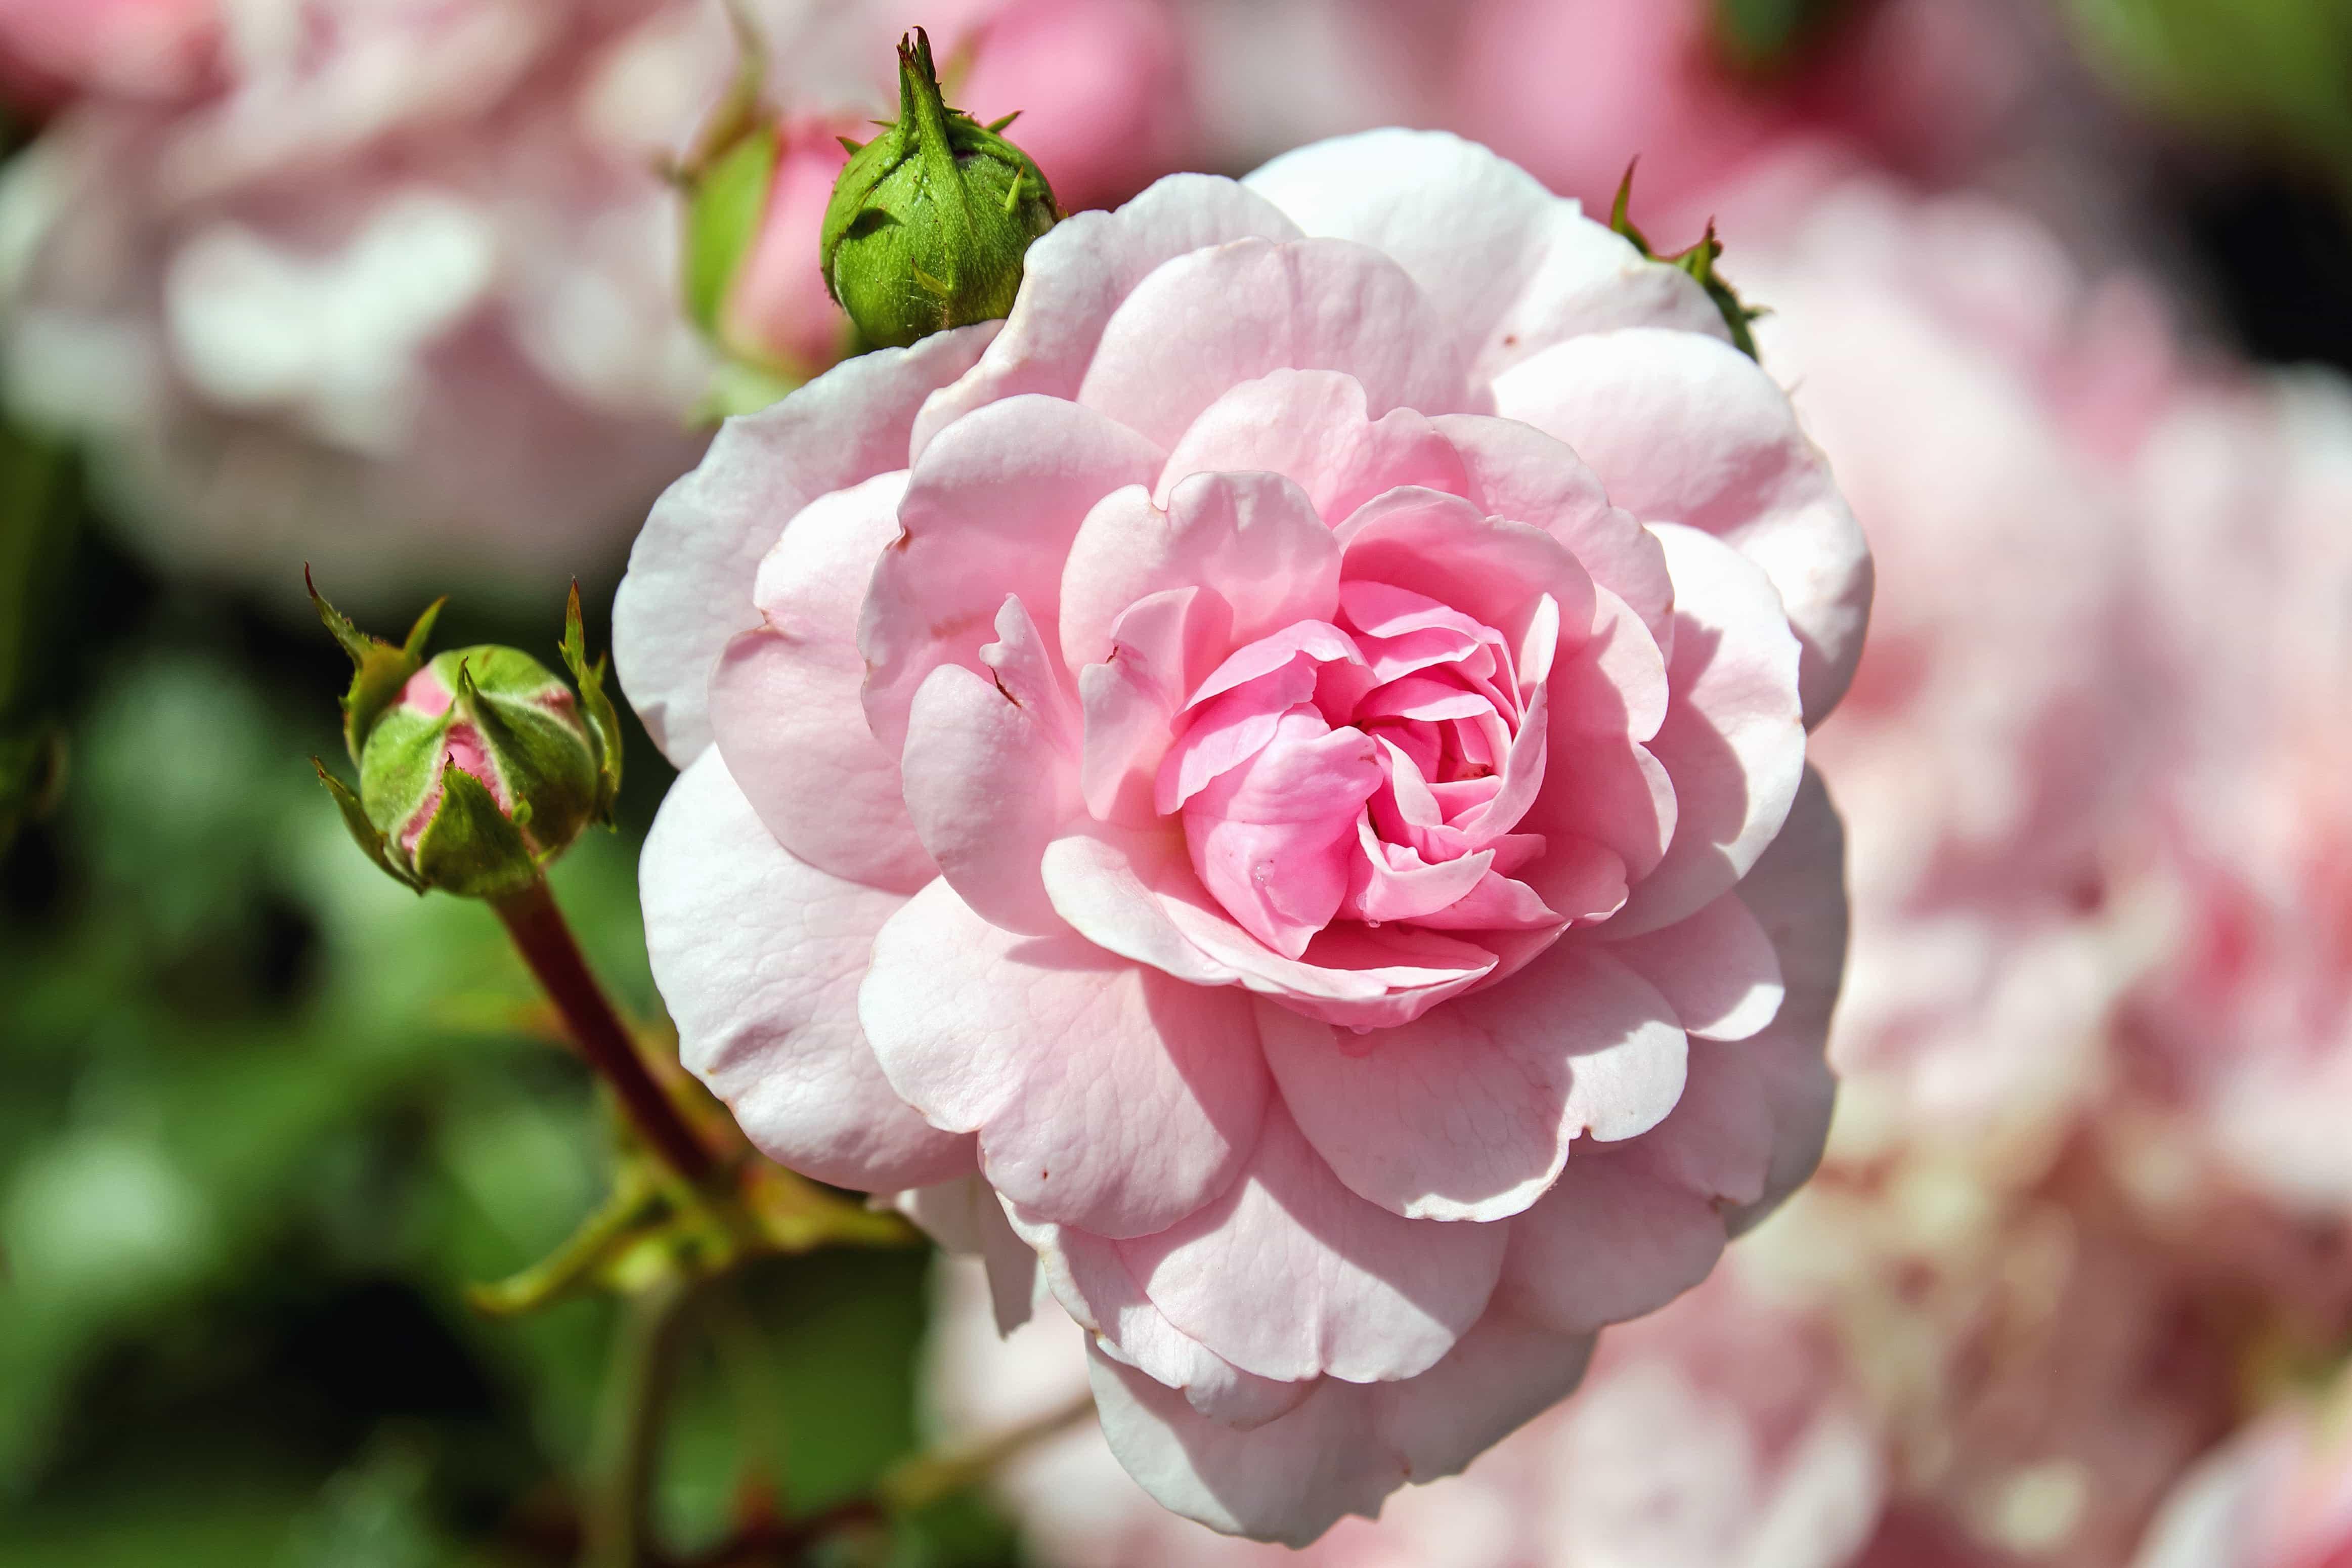 Iphone Landscape Wallpaper Hd Free Picture Rose Garden Leaf Nature Flower Petal